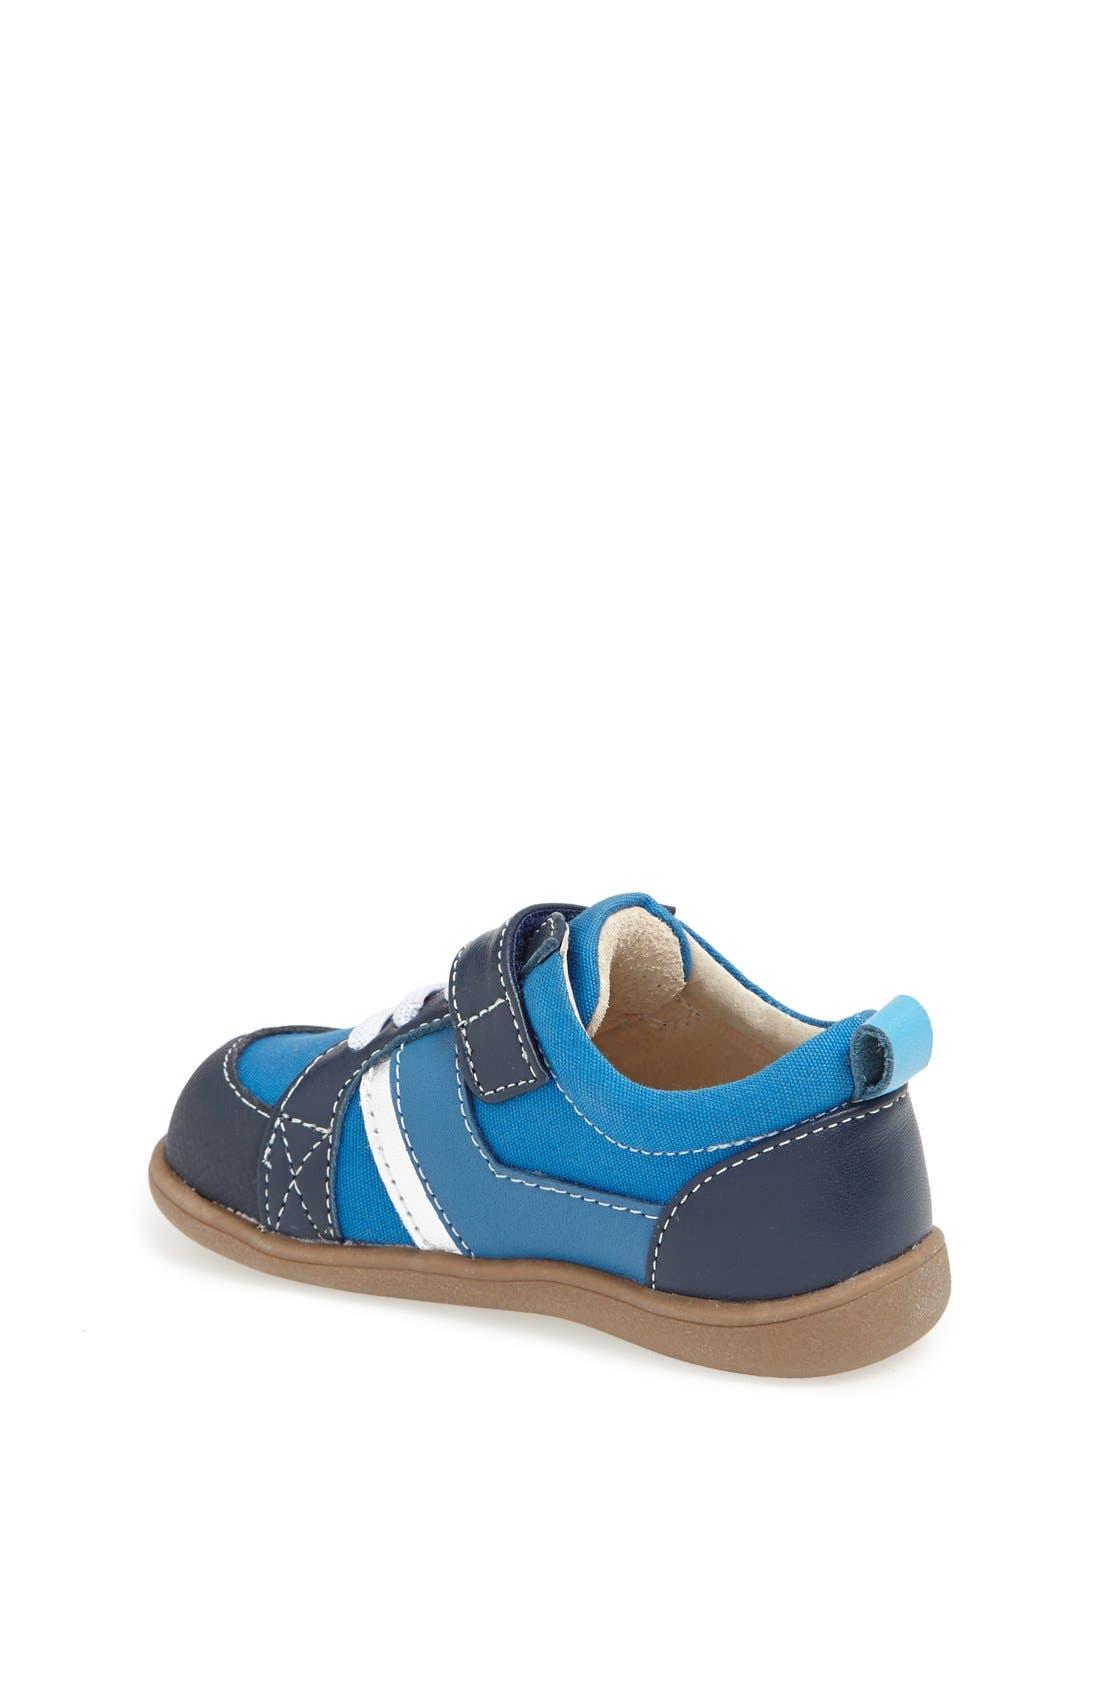 Alternate Image 2  - See Kai Run 'Cash' Sneaker (Baby & Walker)